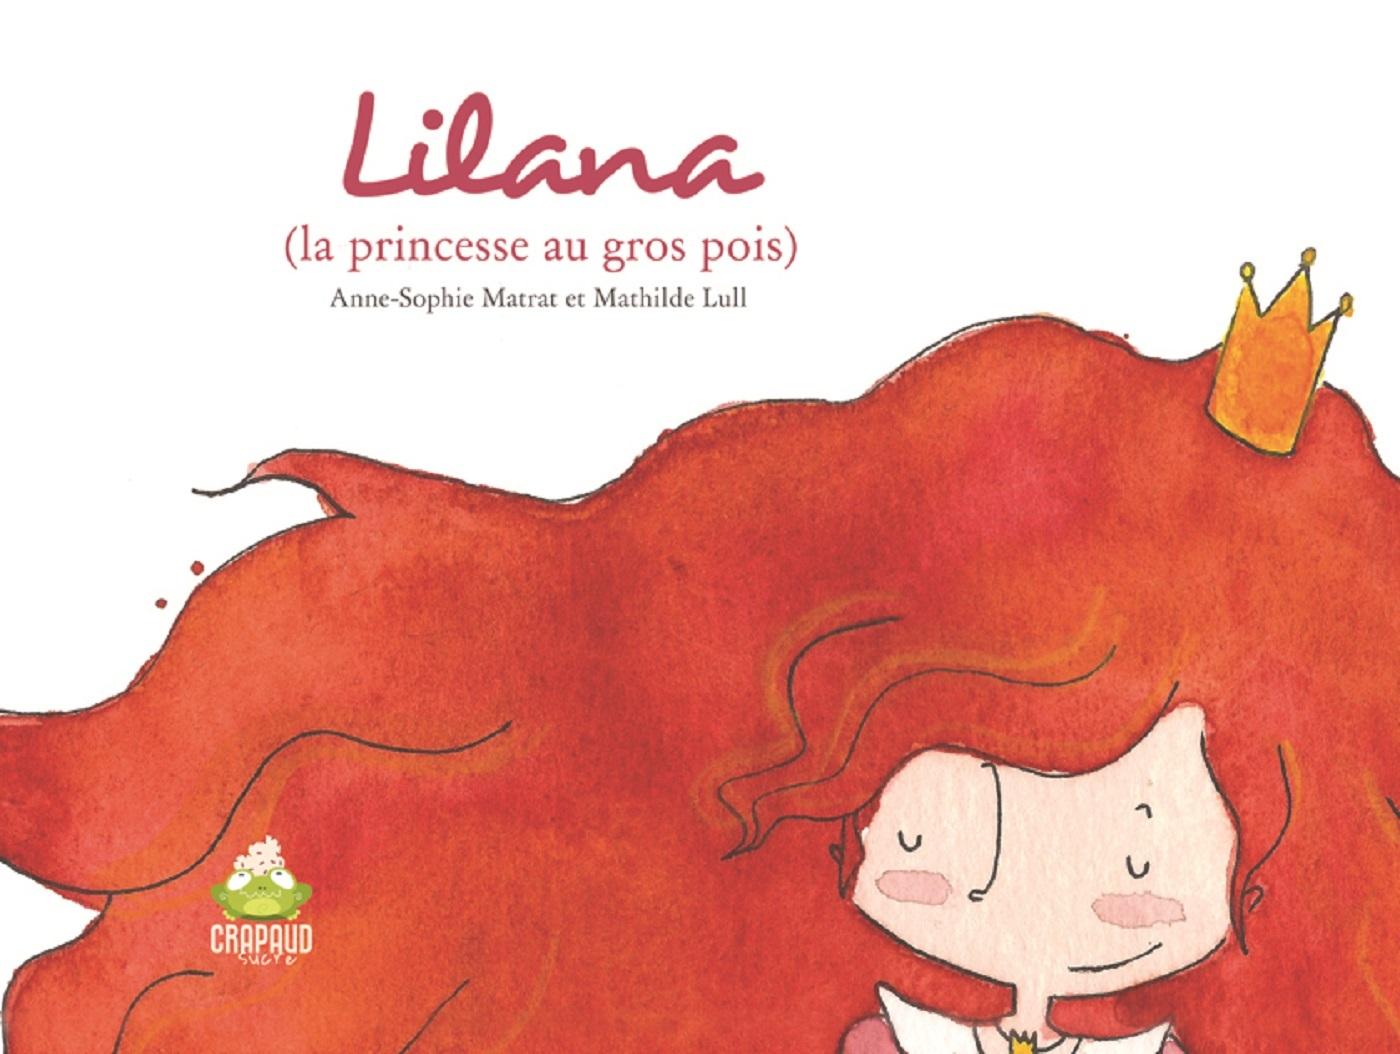 LILANA LA PRINCESSE AU GROS POIS